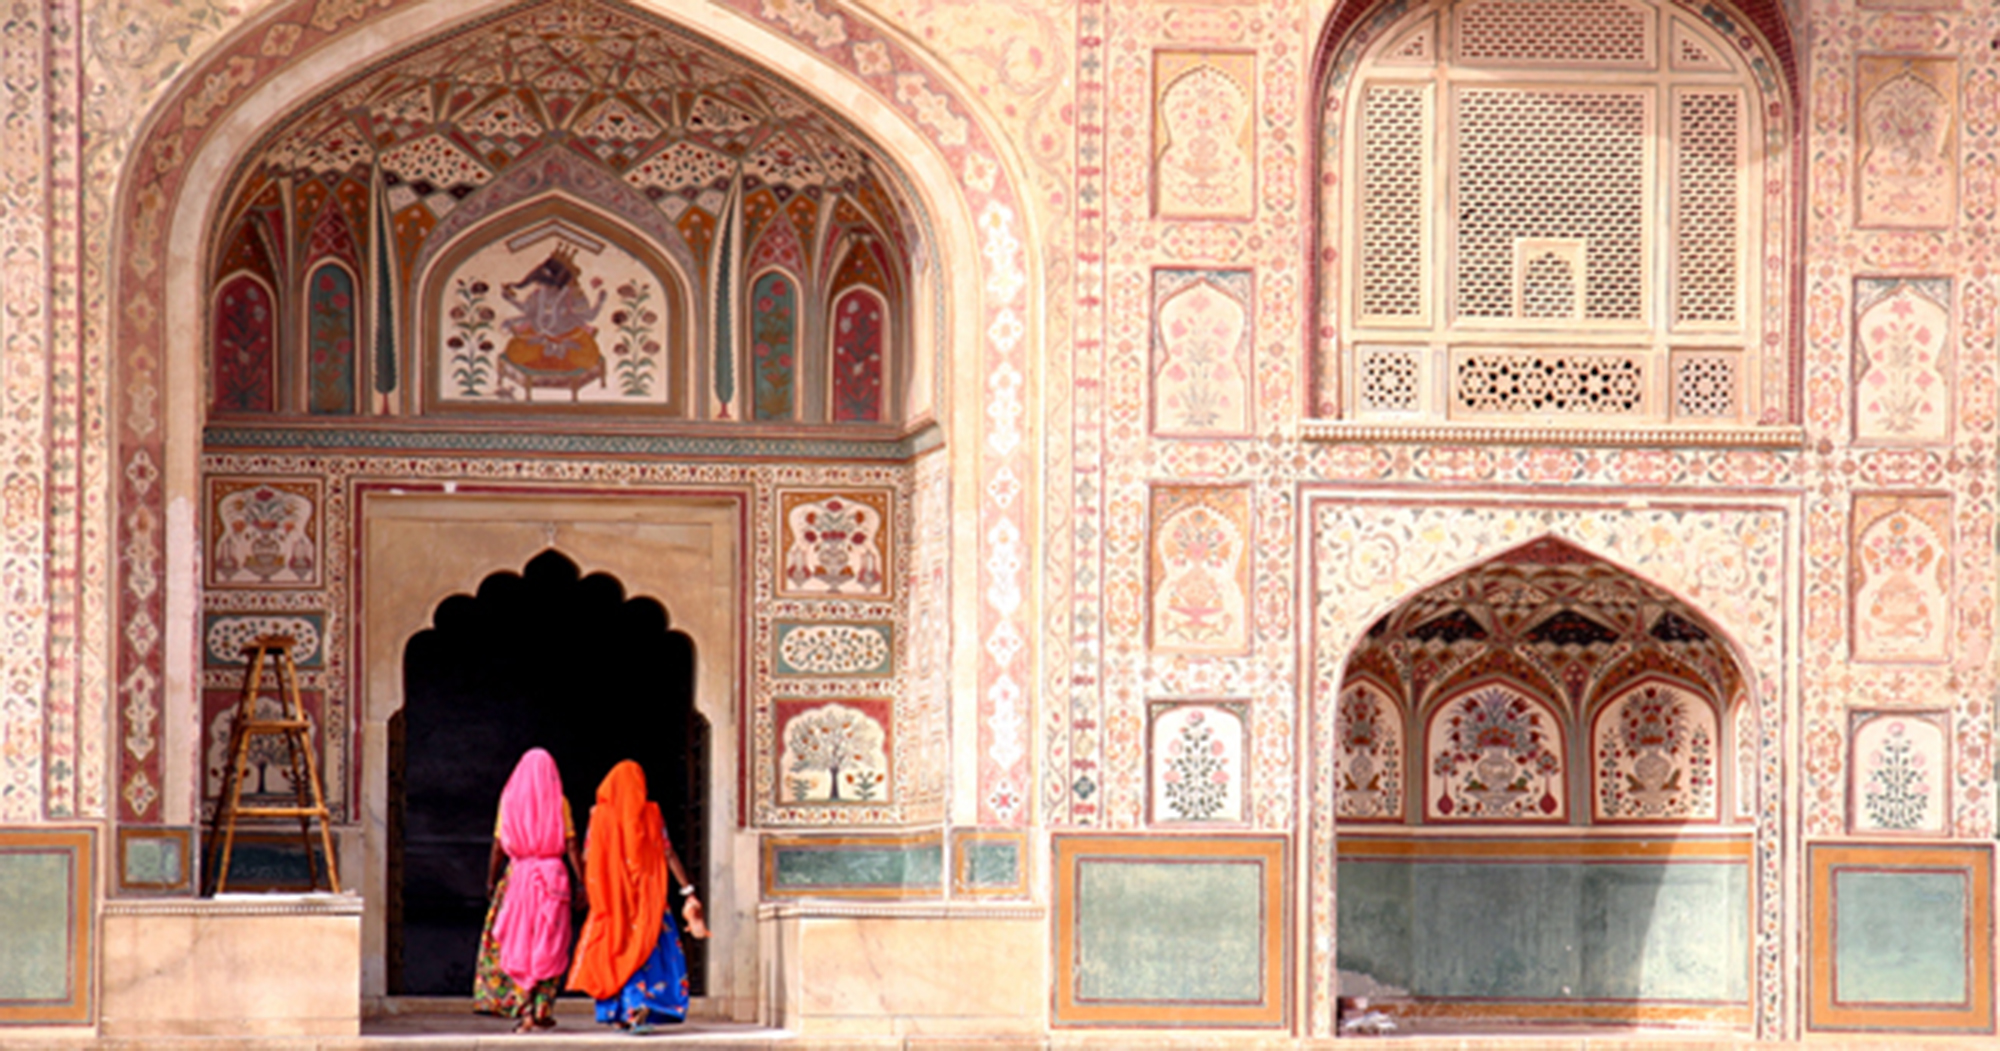 Veduta del Amber Fort, a Jaipur